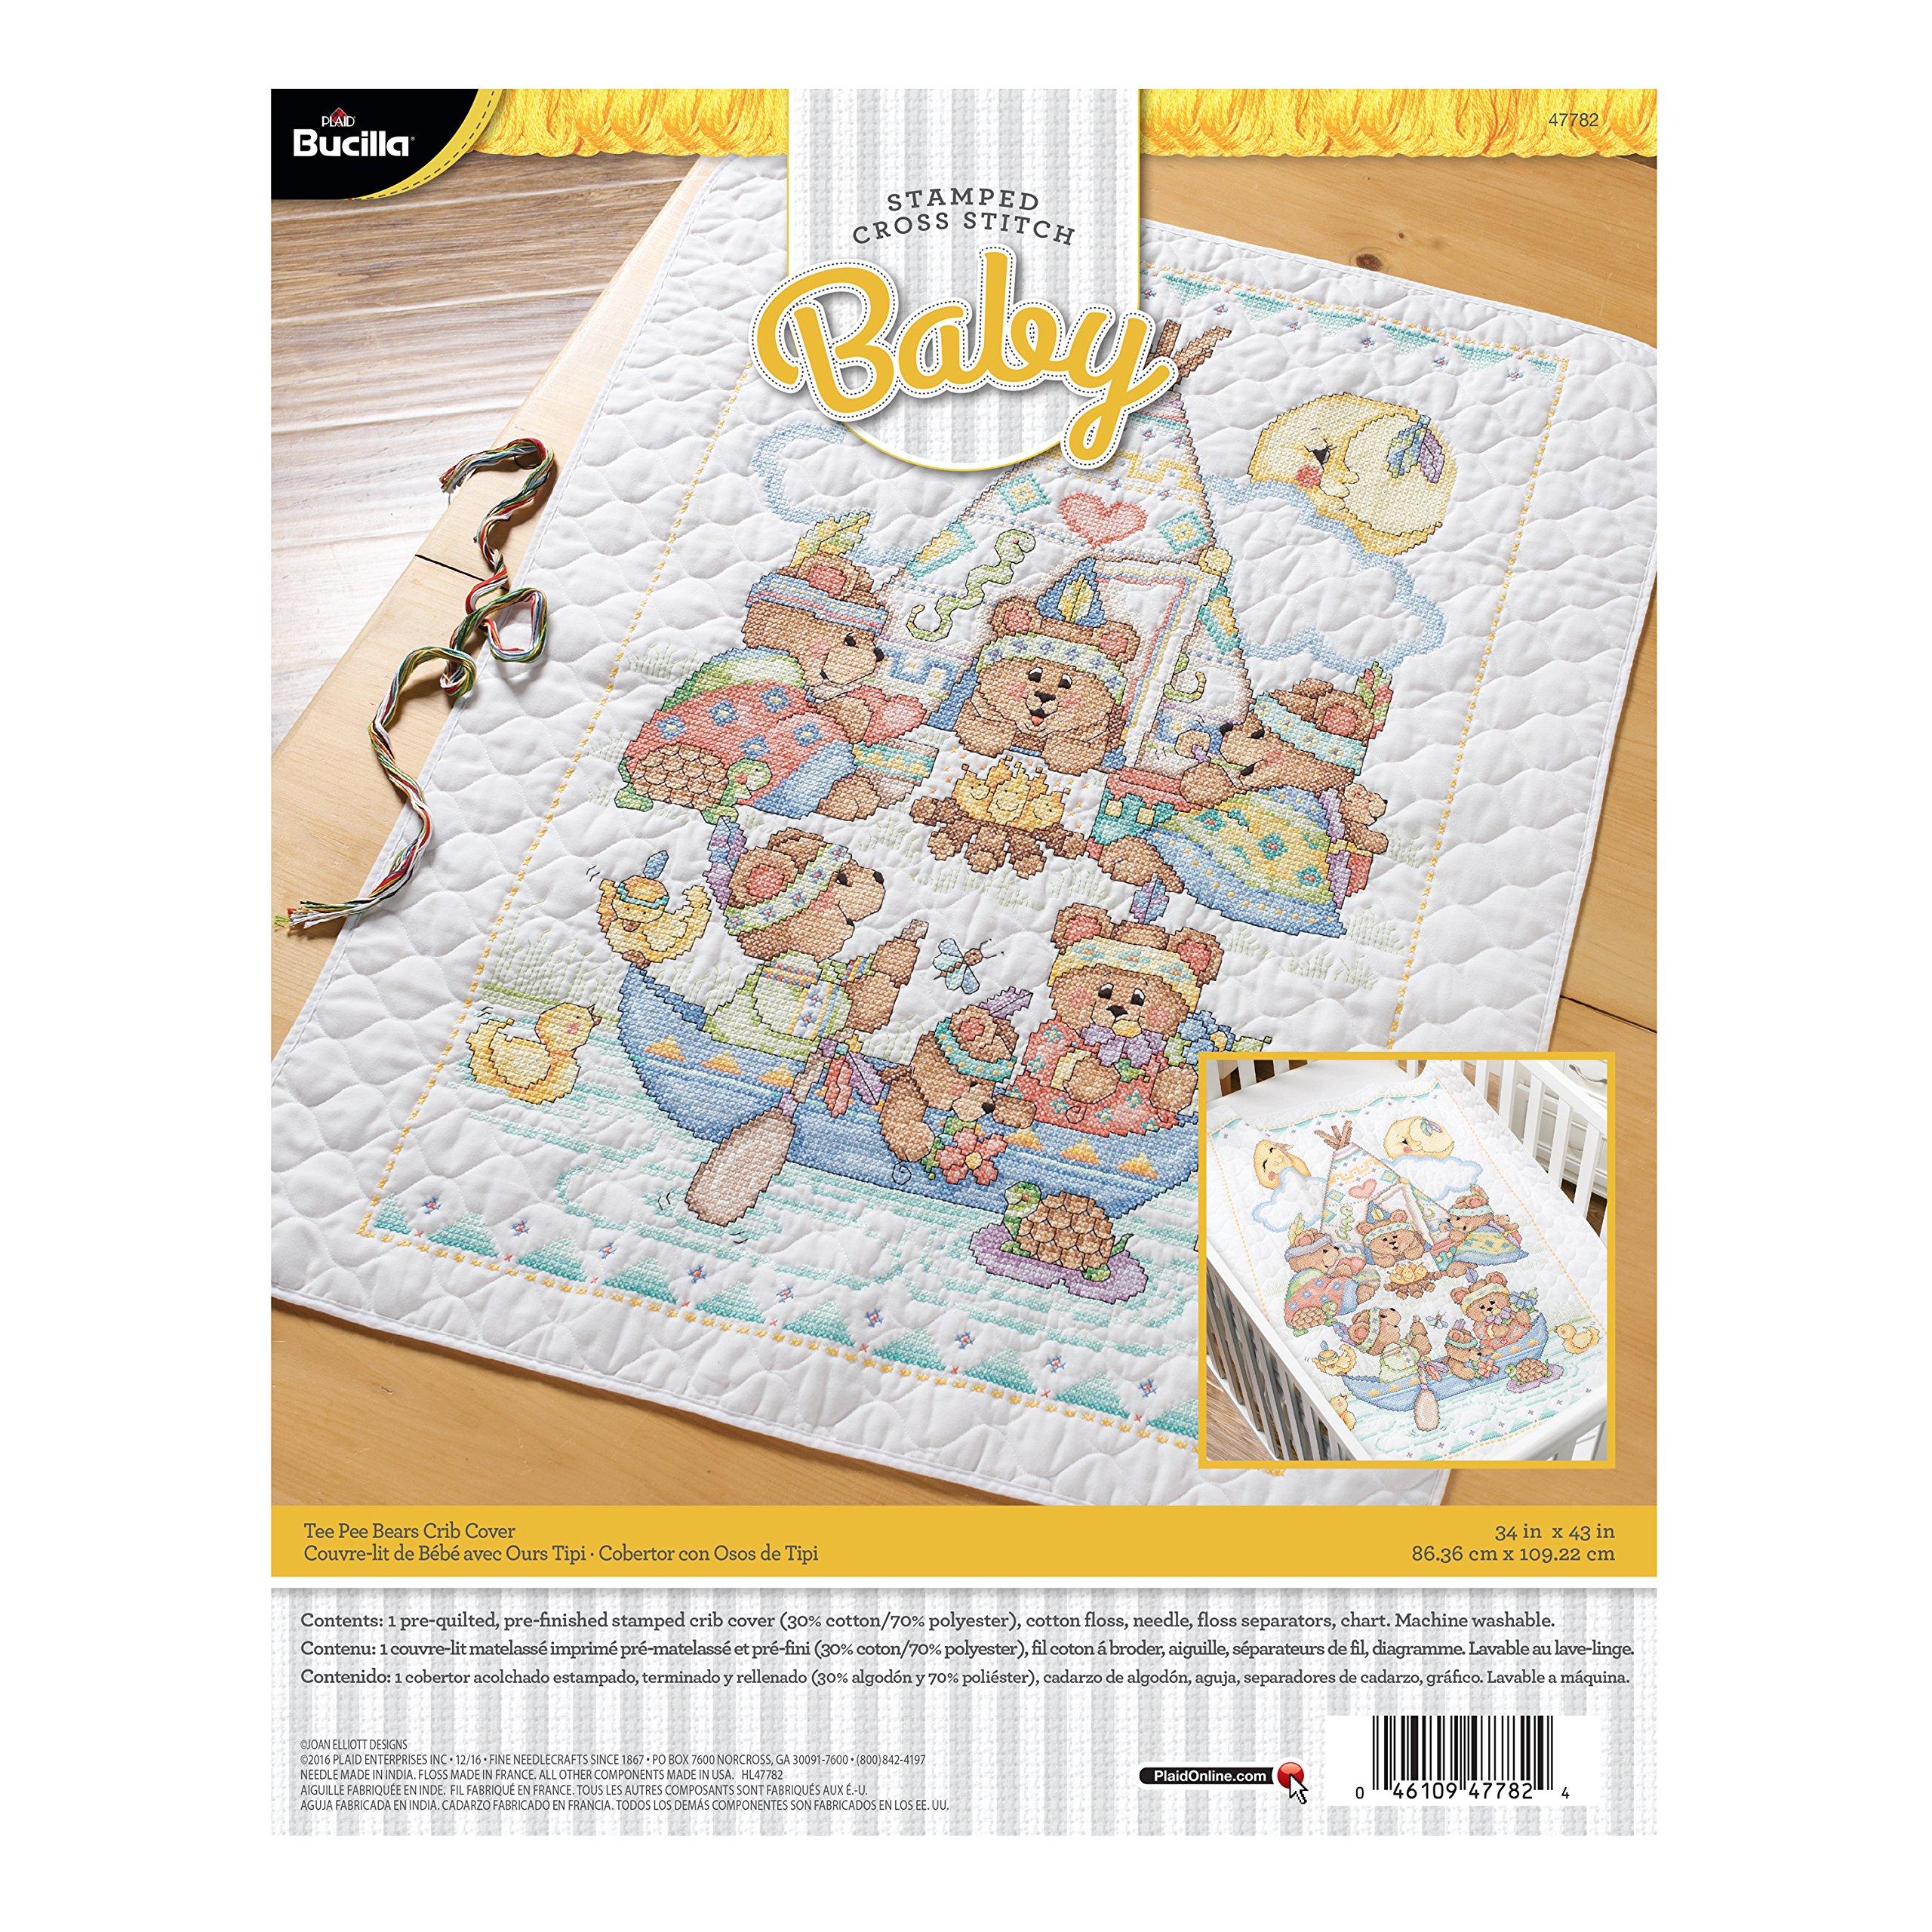 Bucilla 47782 Tee Pee Bears Stamped Cross Stitch Kit, 34'' x 43'', Crib Cover by Bucilla